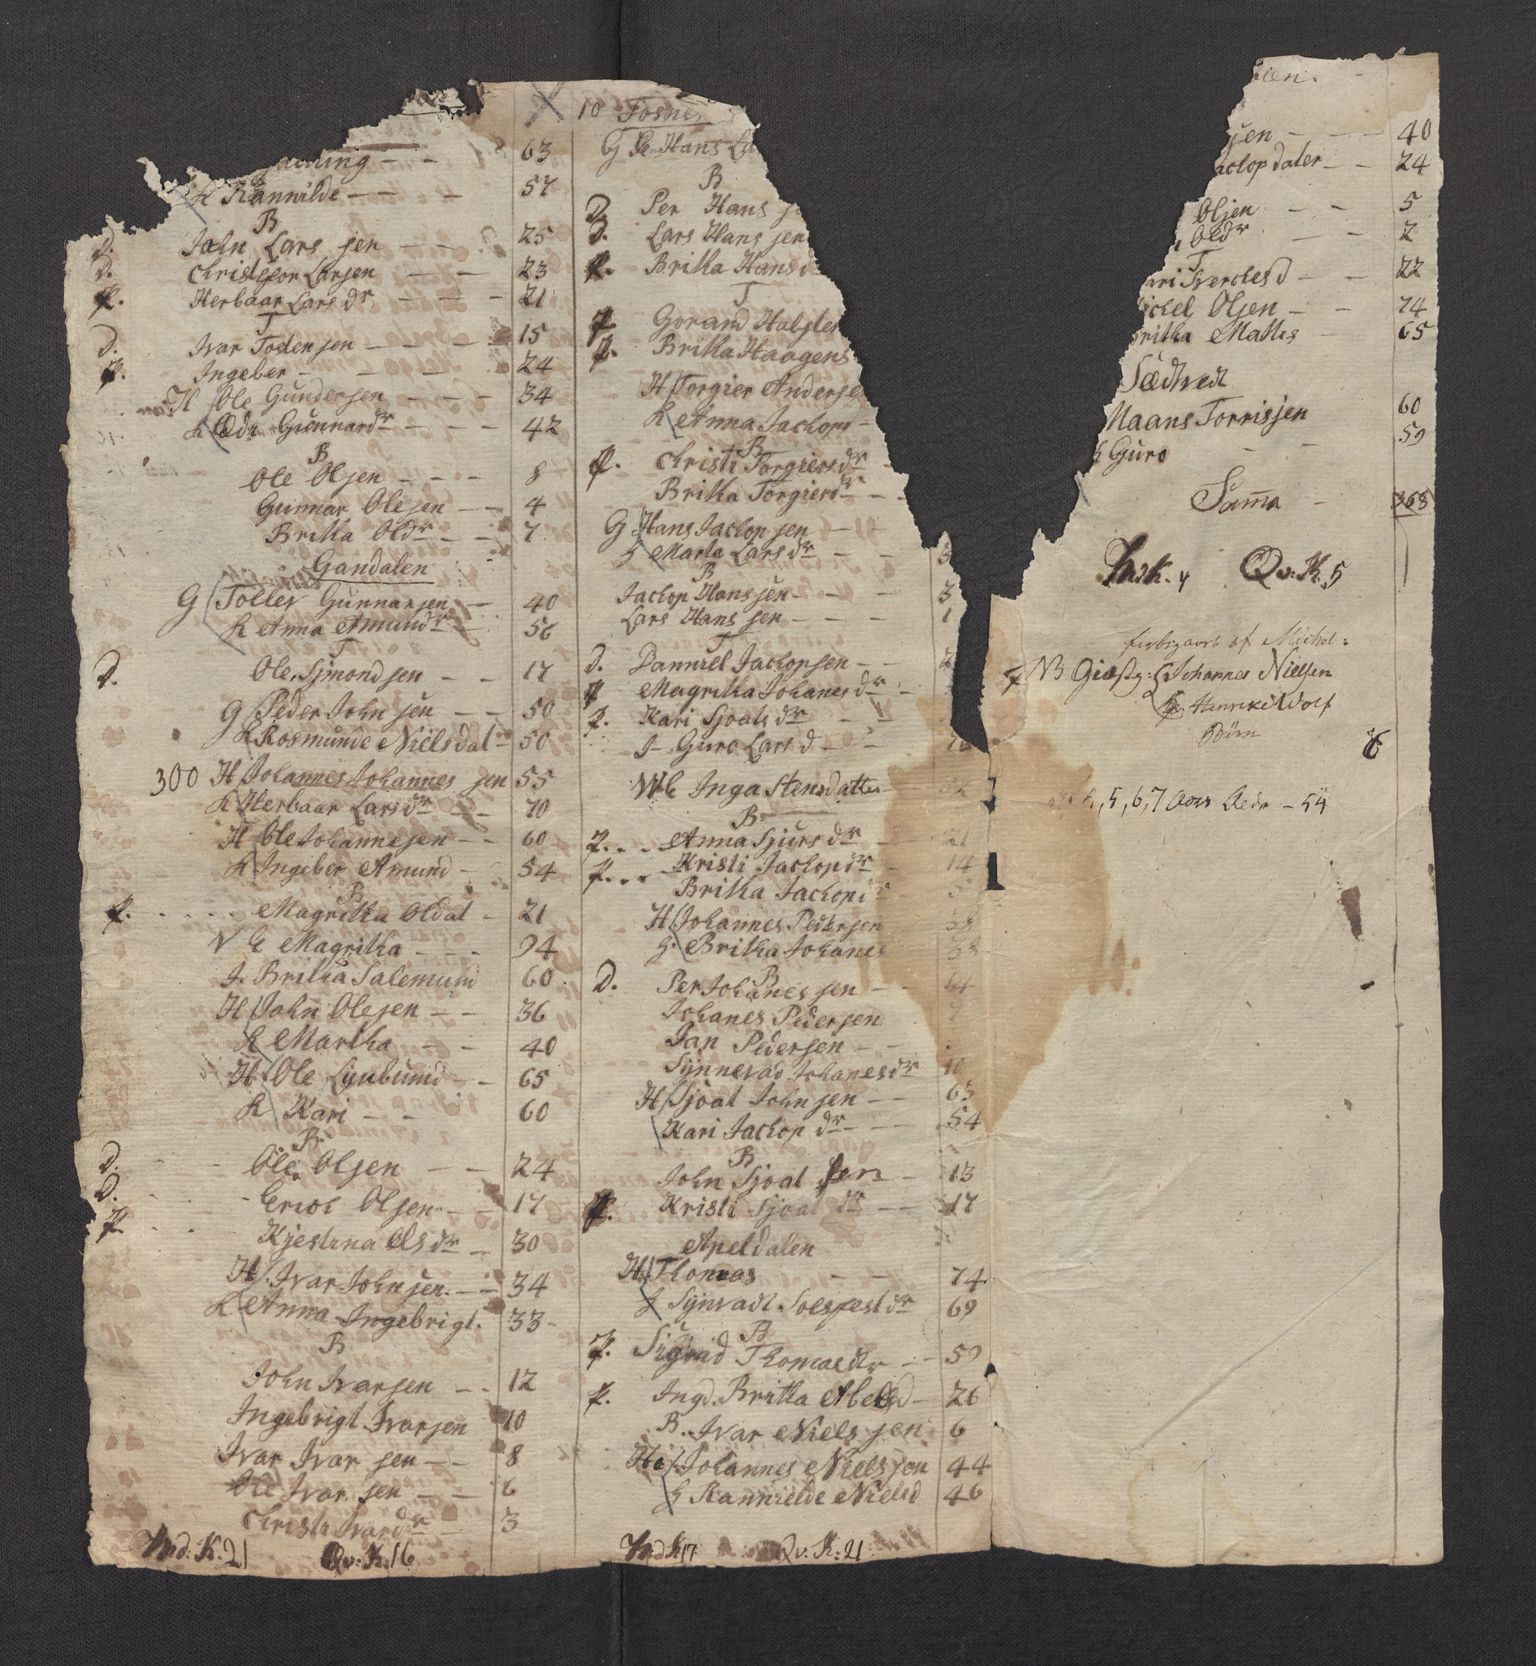 SAB, Folketelling 1815 for 1226P Strandebarm prestegjeld, 1815, s. 6